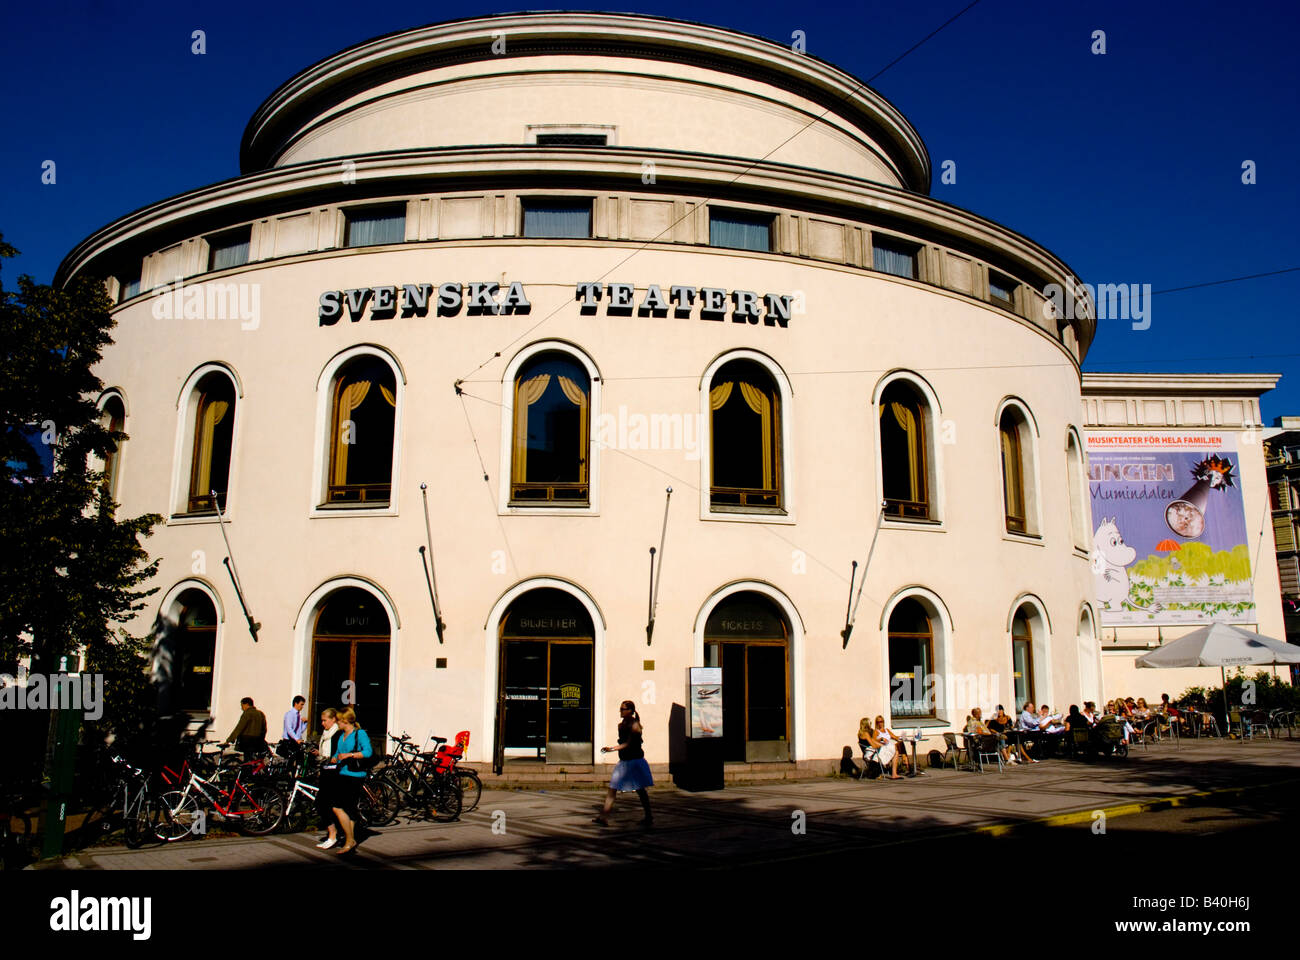 Svenska Teatern the Swedish language theatre in Helsinki Finland Europe - Stock Image